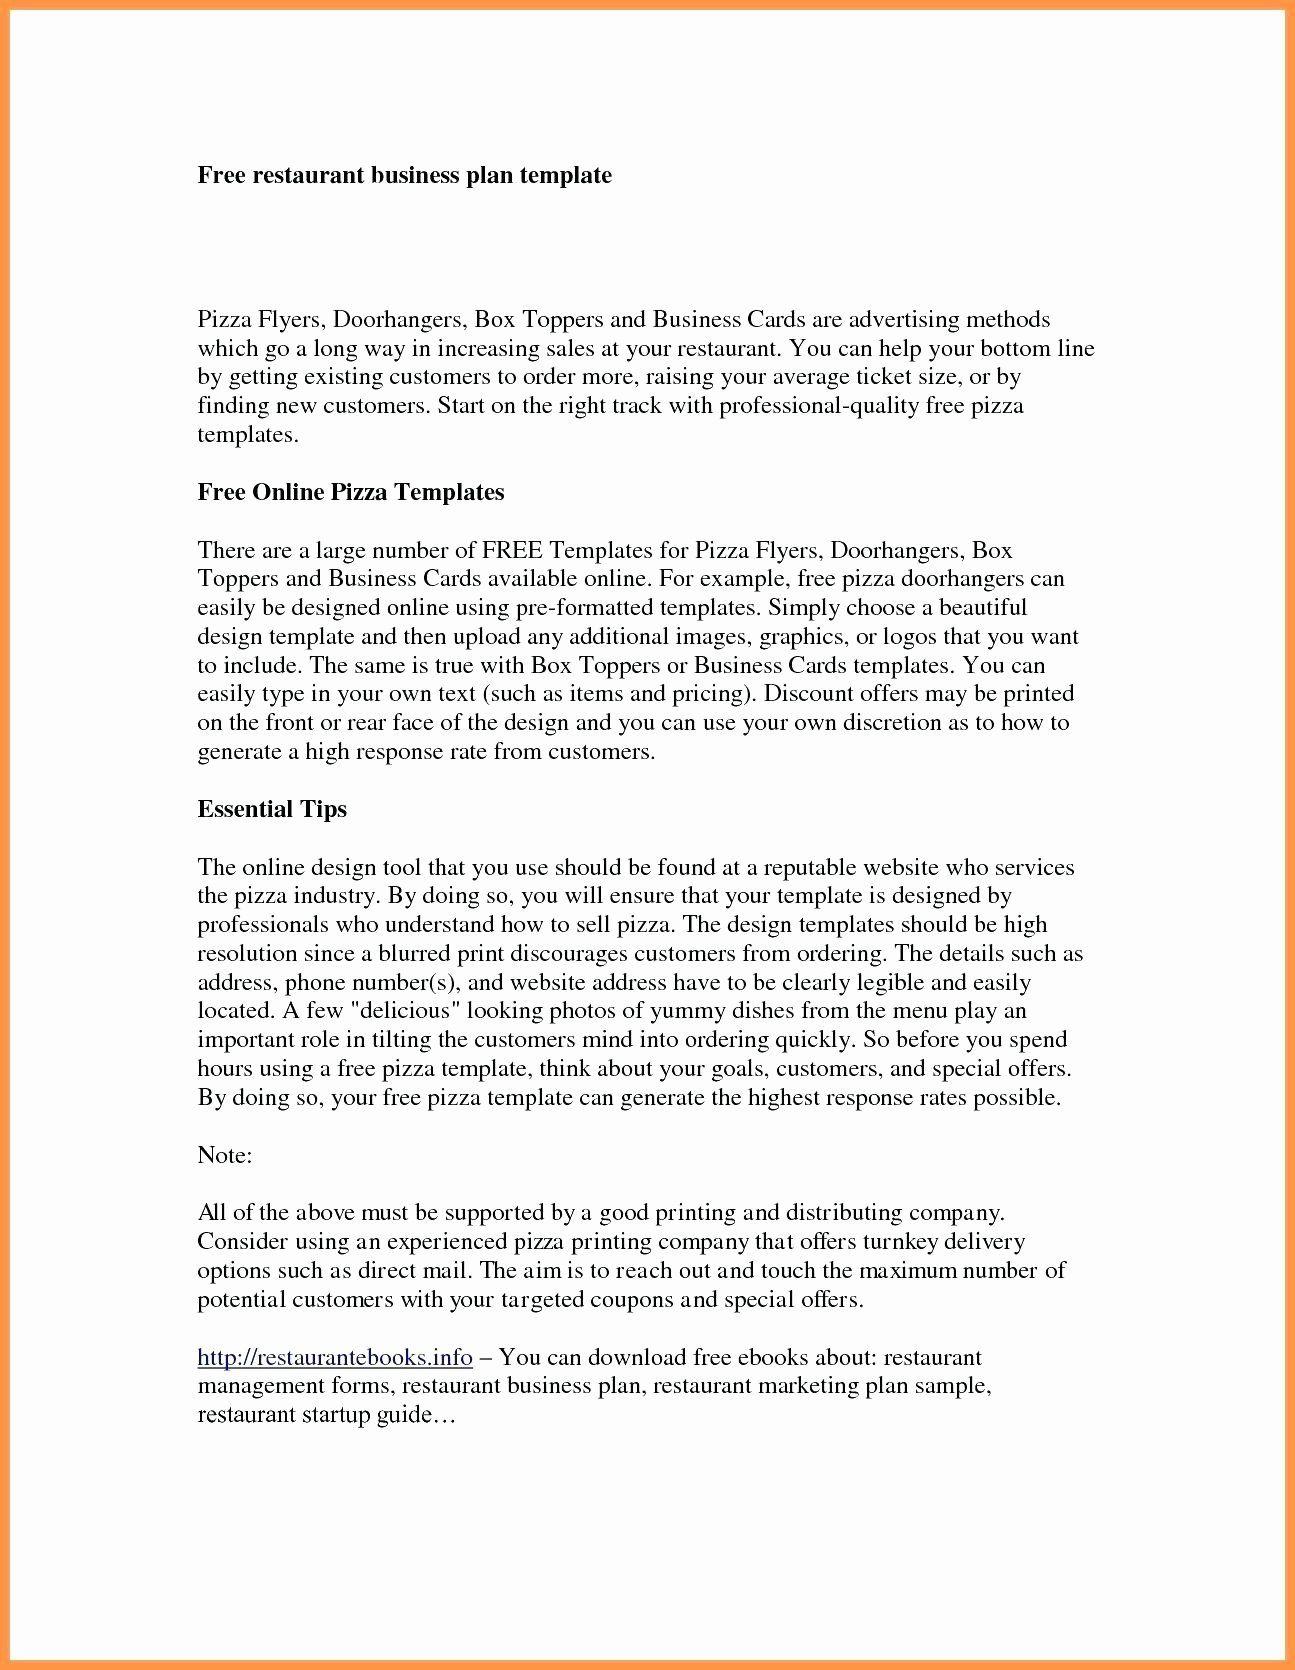 App Business Plan Template Lovely Start Up Business Plan Sample Startup Marketing Pl Business Proposal Template Restaurant Business Plan Business Plan Template